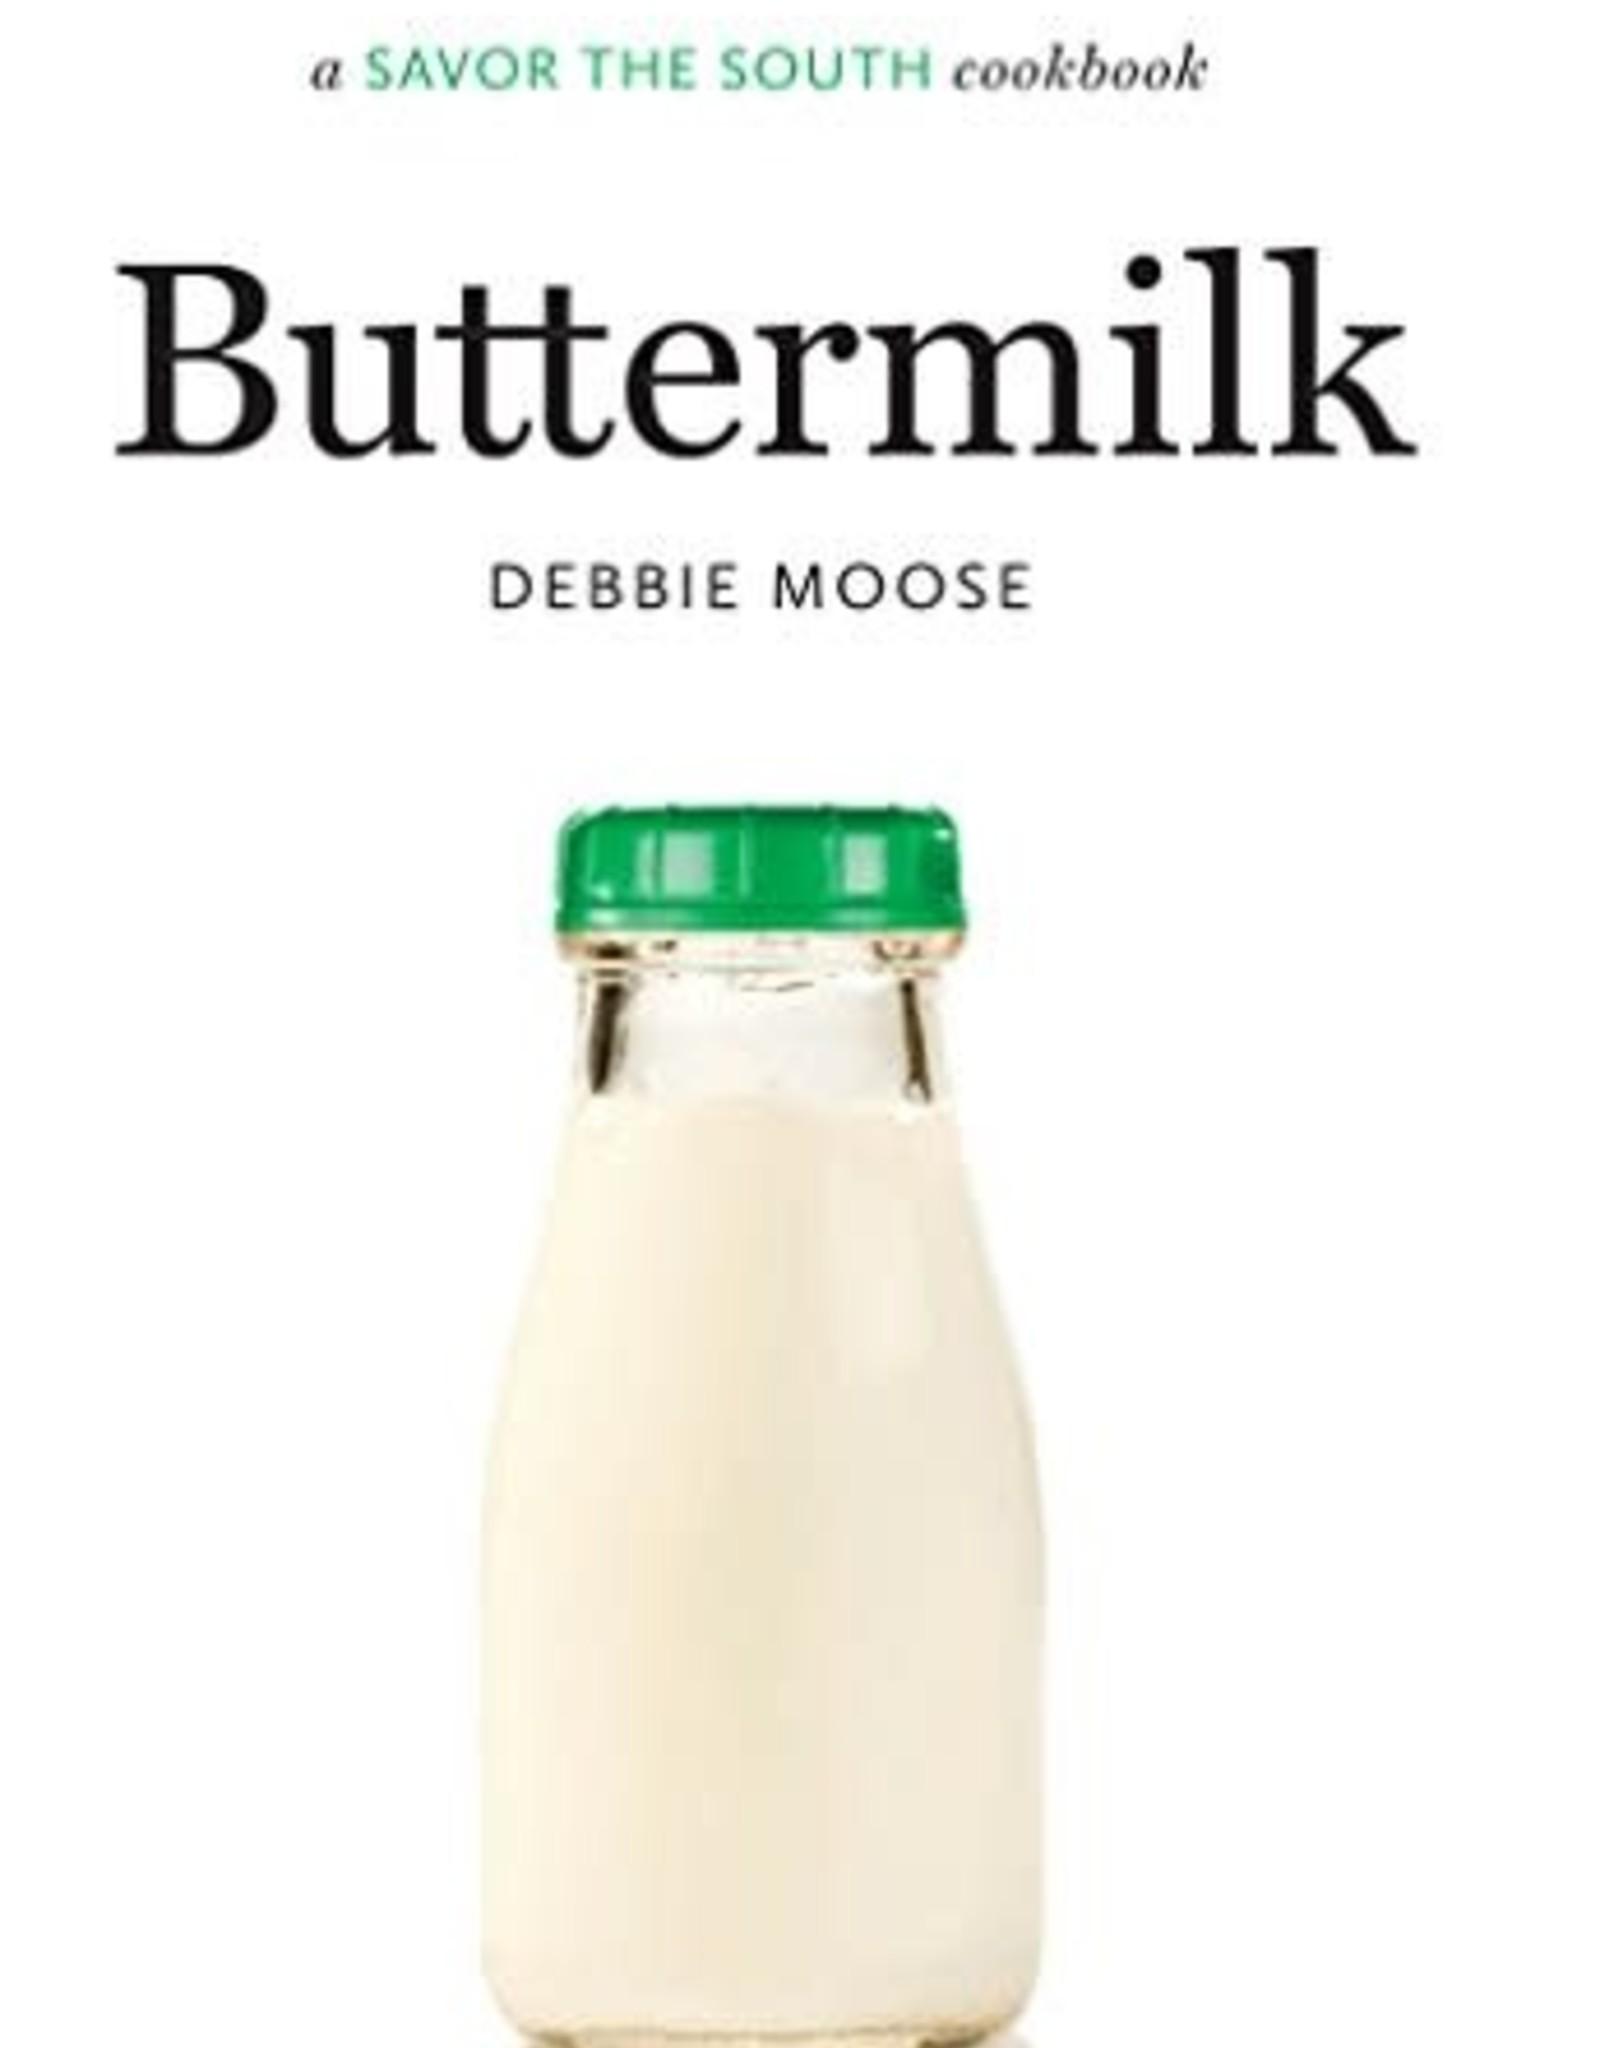 Savor the South: Buttermilk